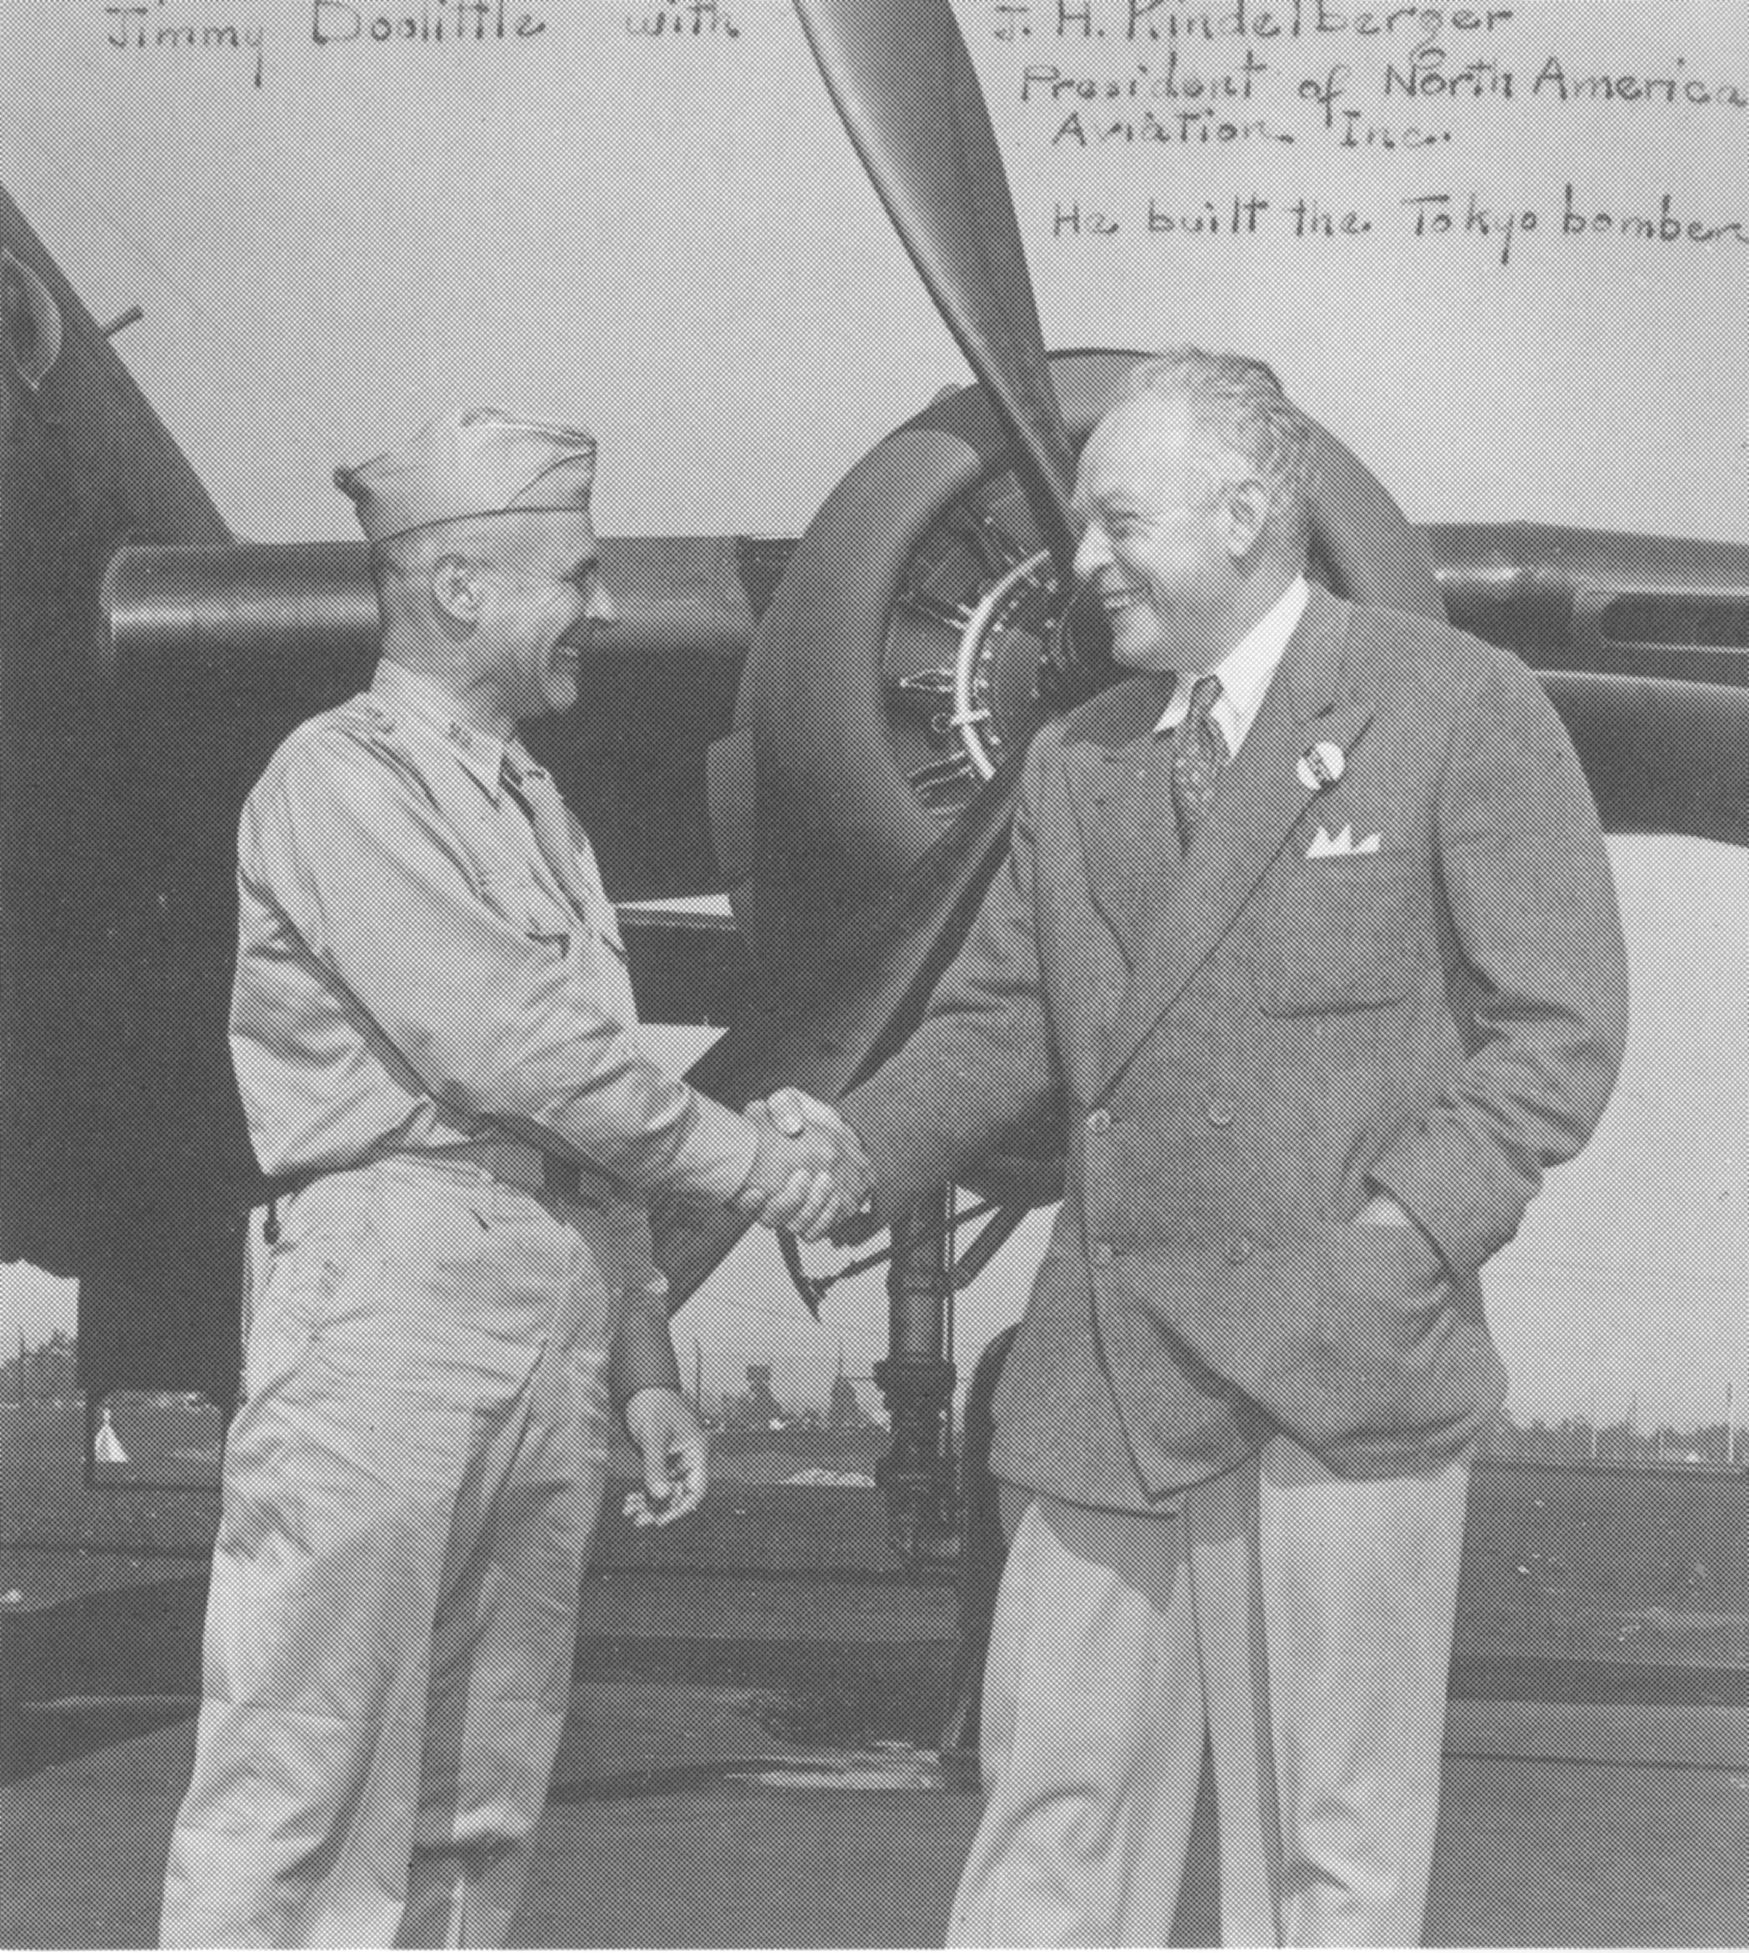 General Jimmy Doolittle and good friend Dutch Kindelberger